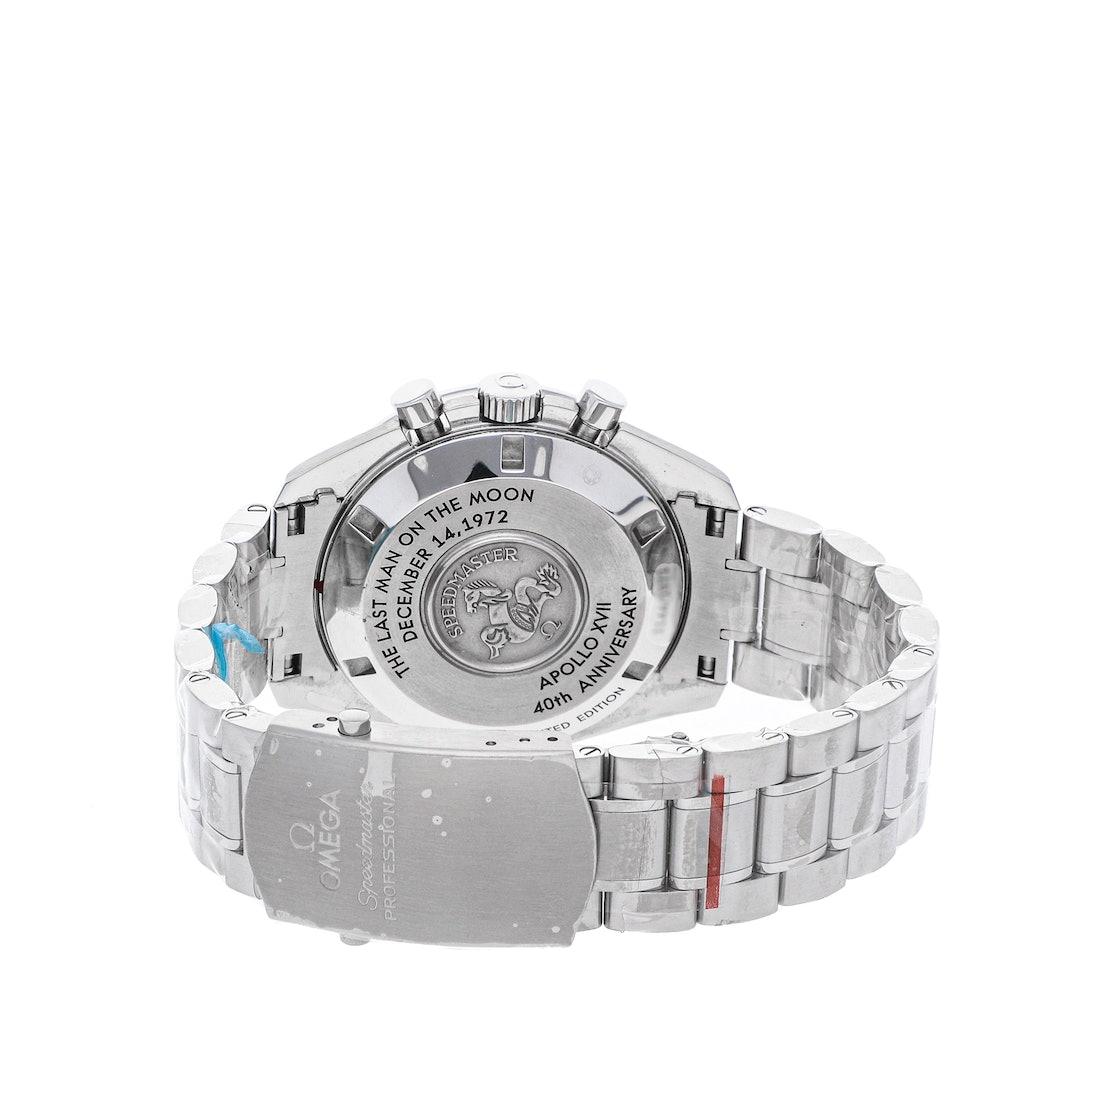 Omega Speedmaster Moonwatch Apollo XVII Anniversary Limited Edition 311.30.42.30.99.002